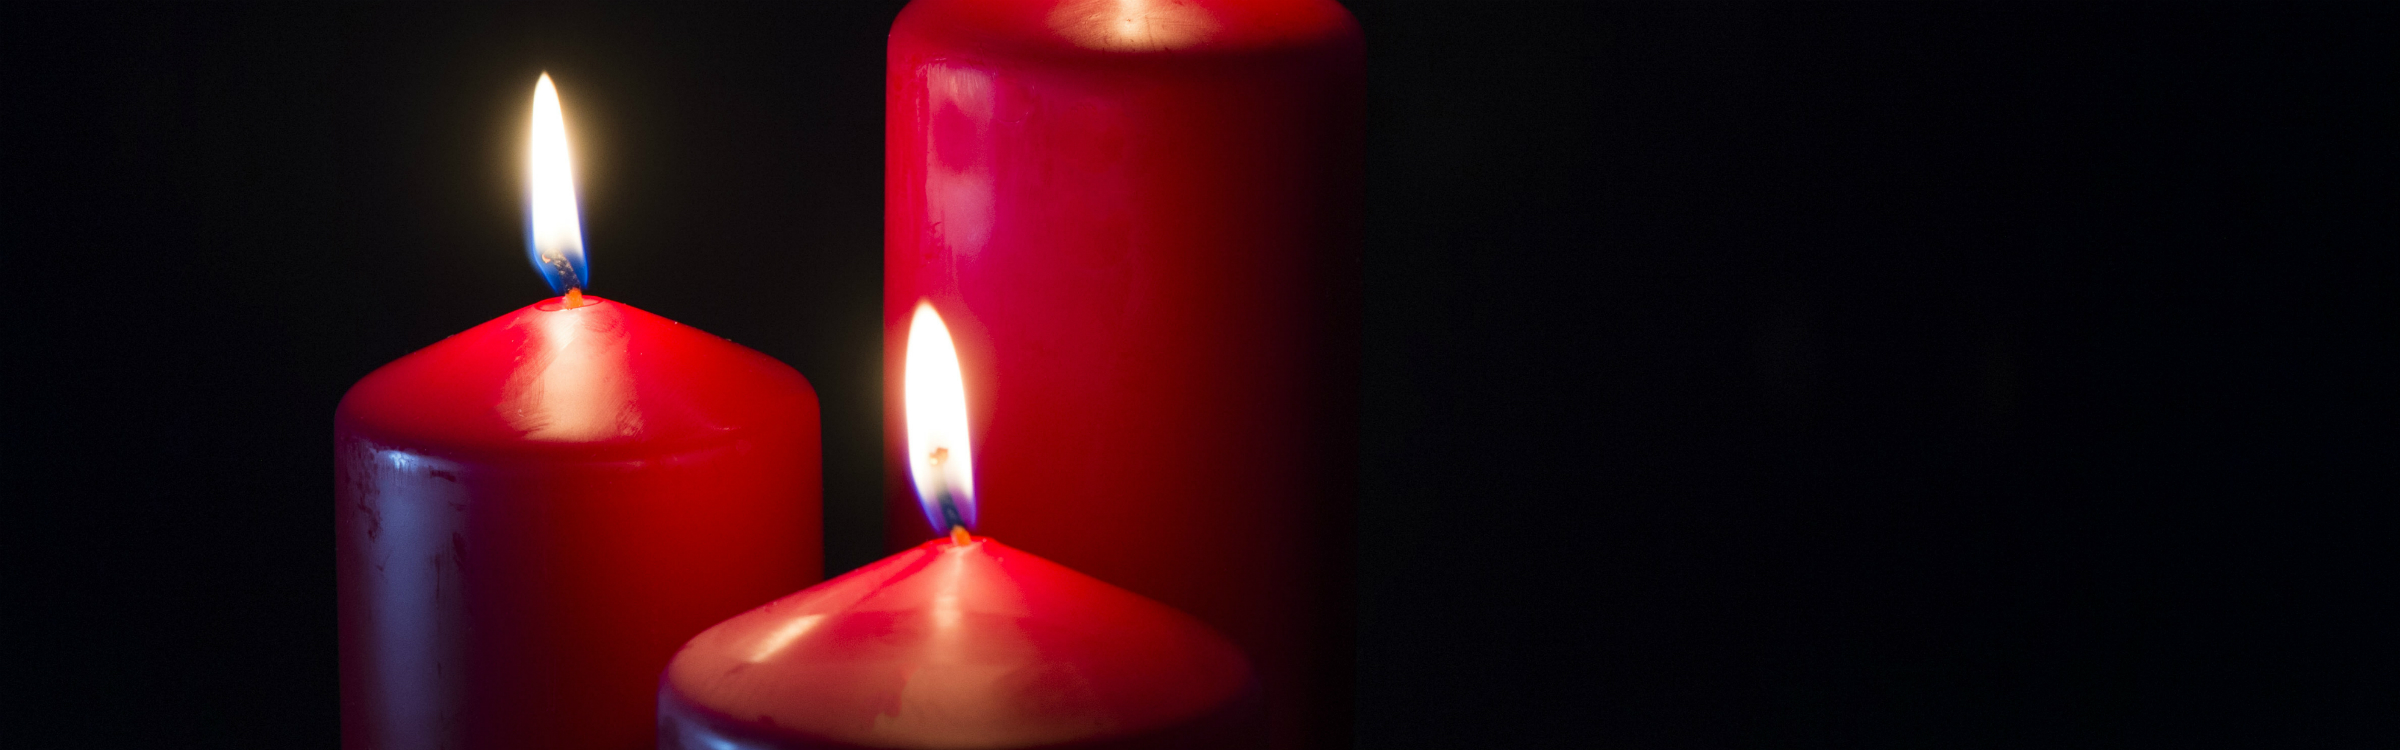 Kaarsen.jpg header